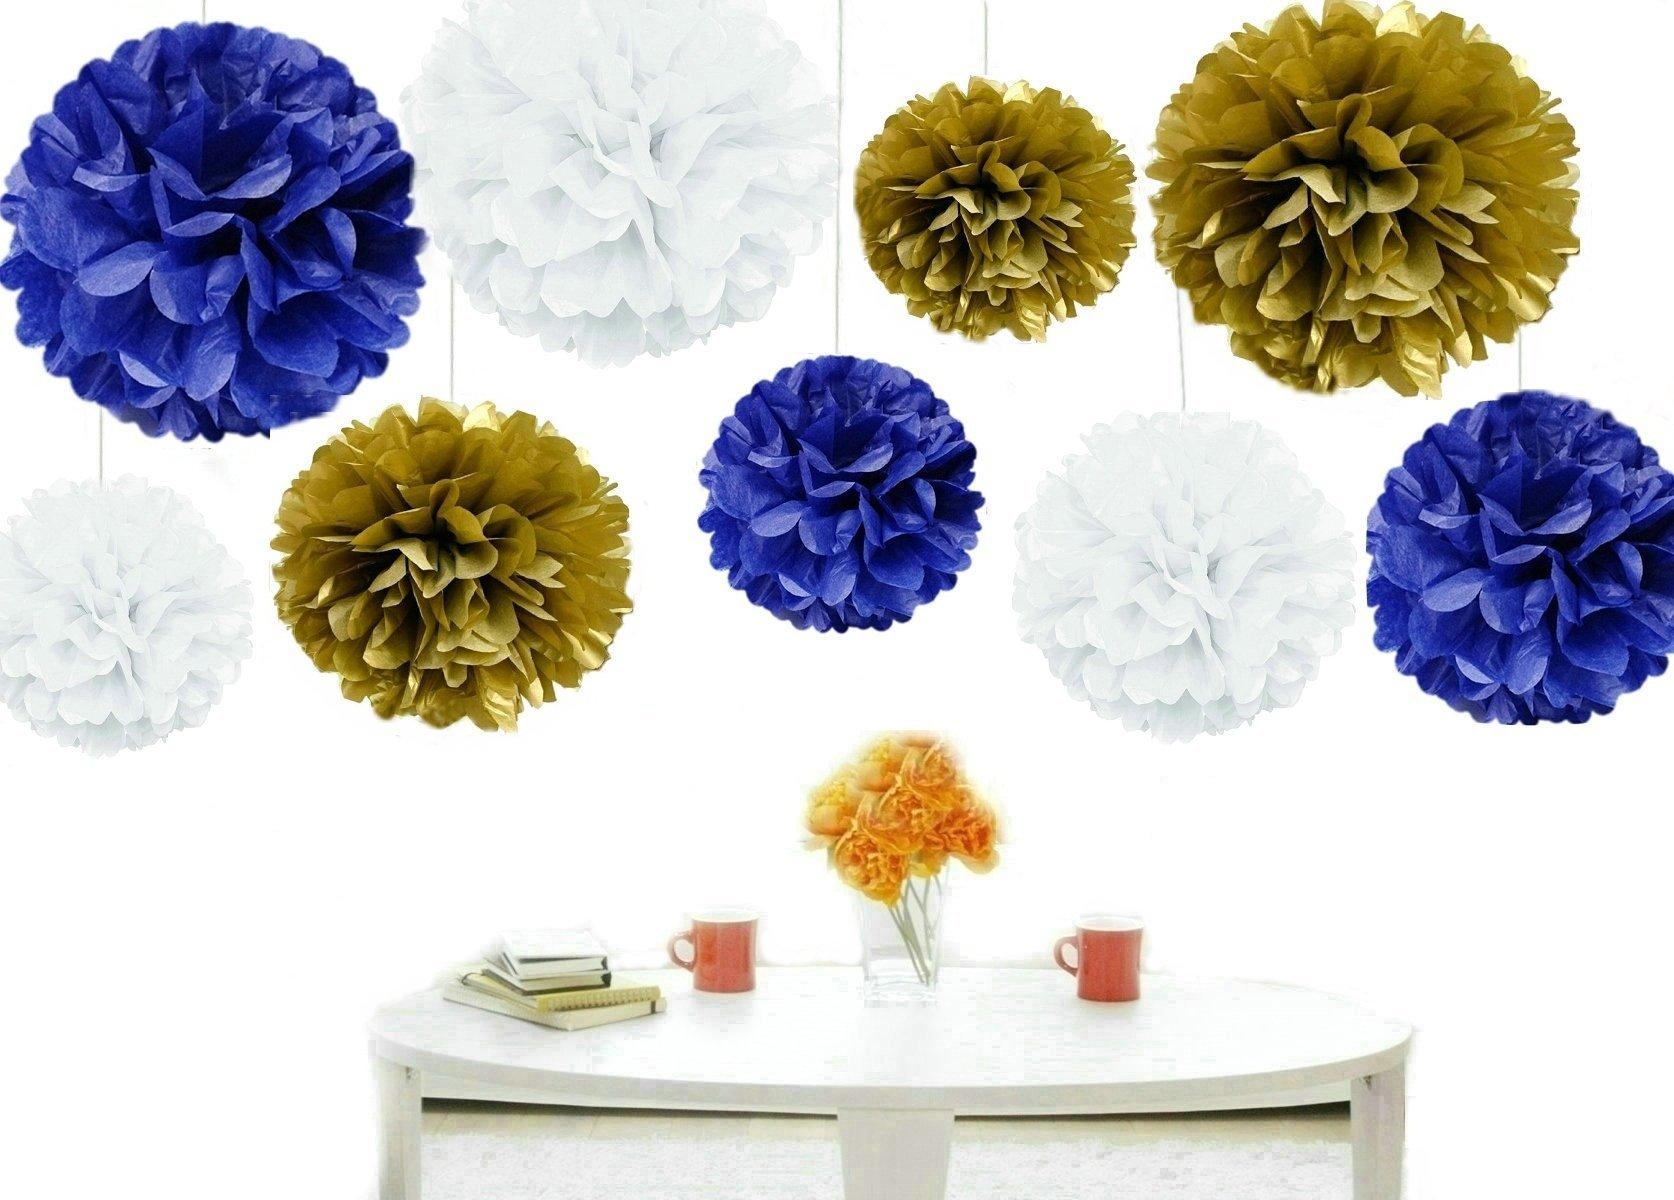 Kubert® Pom Poms -18Pcs of 8'' 10'' 14'' Multi-Colors Tissue Paper Flowers Pom Poms Wedding Decor Party Decor Pom Pom Flowers Pom Poms Craft Pom Poms Decoration-Vintage Hanging Lantern